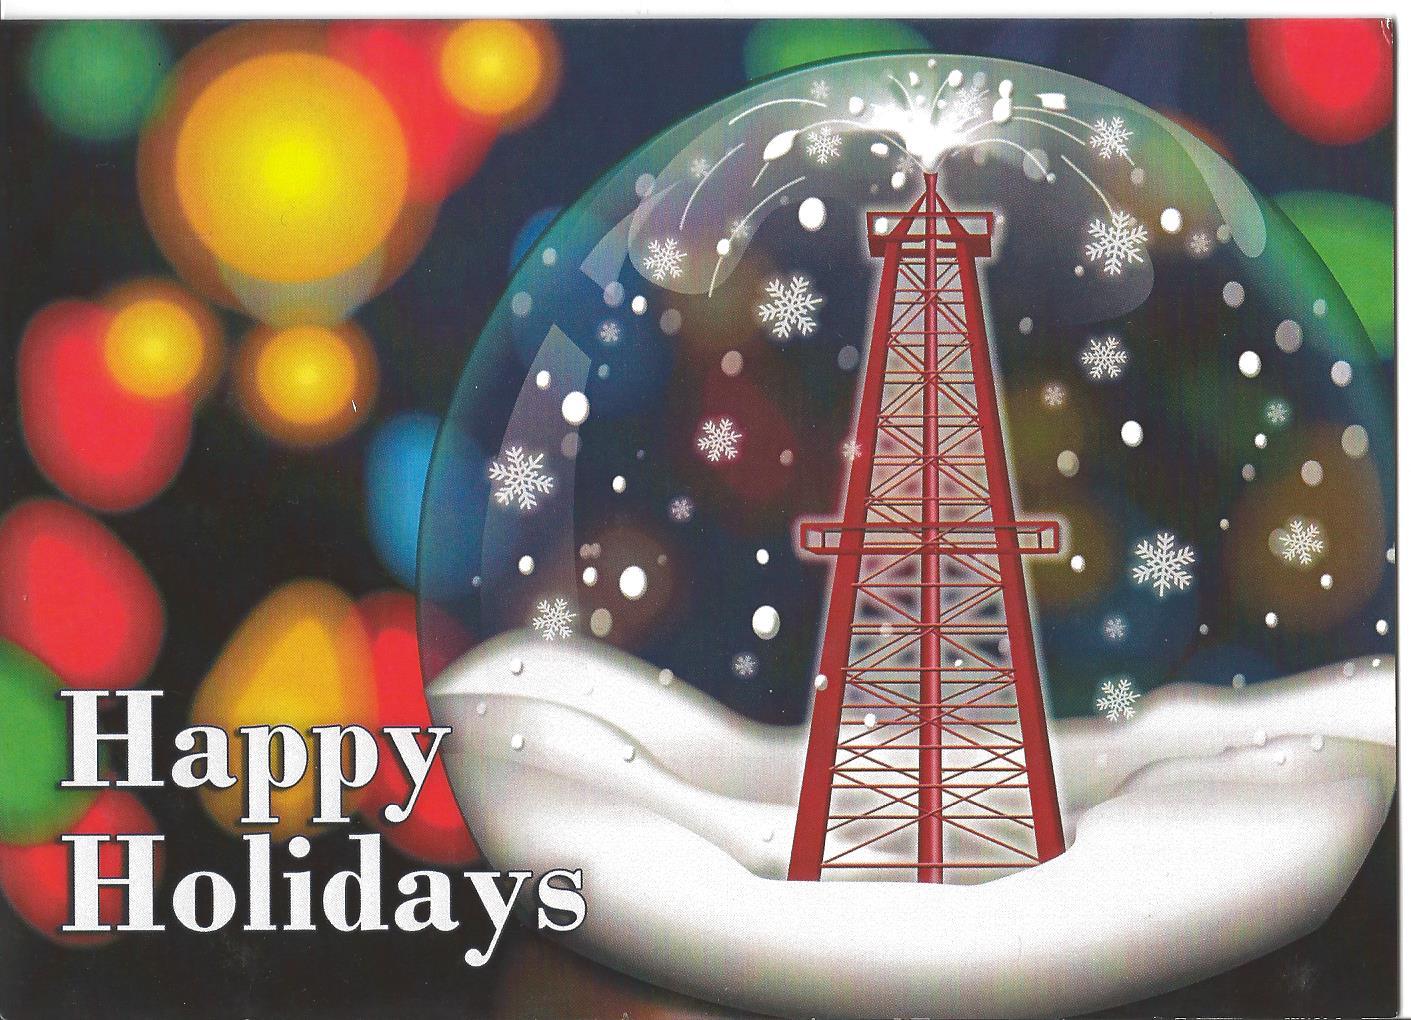 Merry Christmas   Zman's Energy Brain ~ oil, gas, stocks, etc...